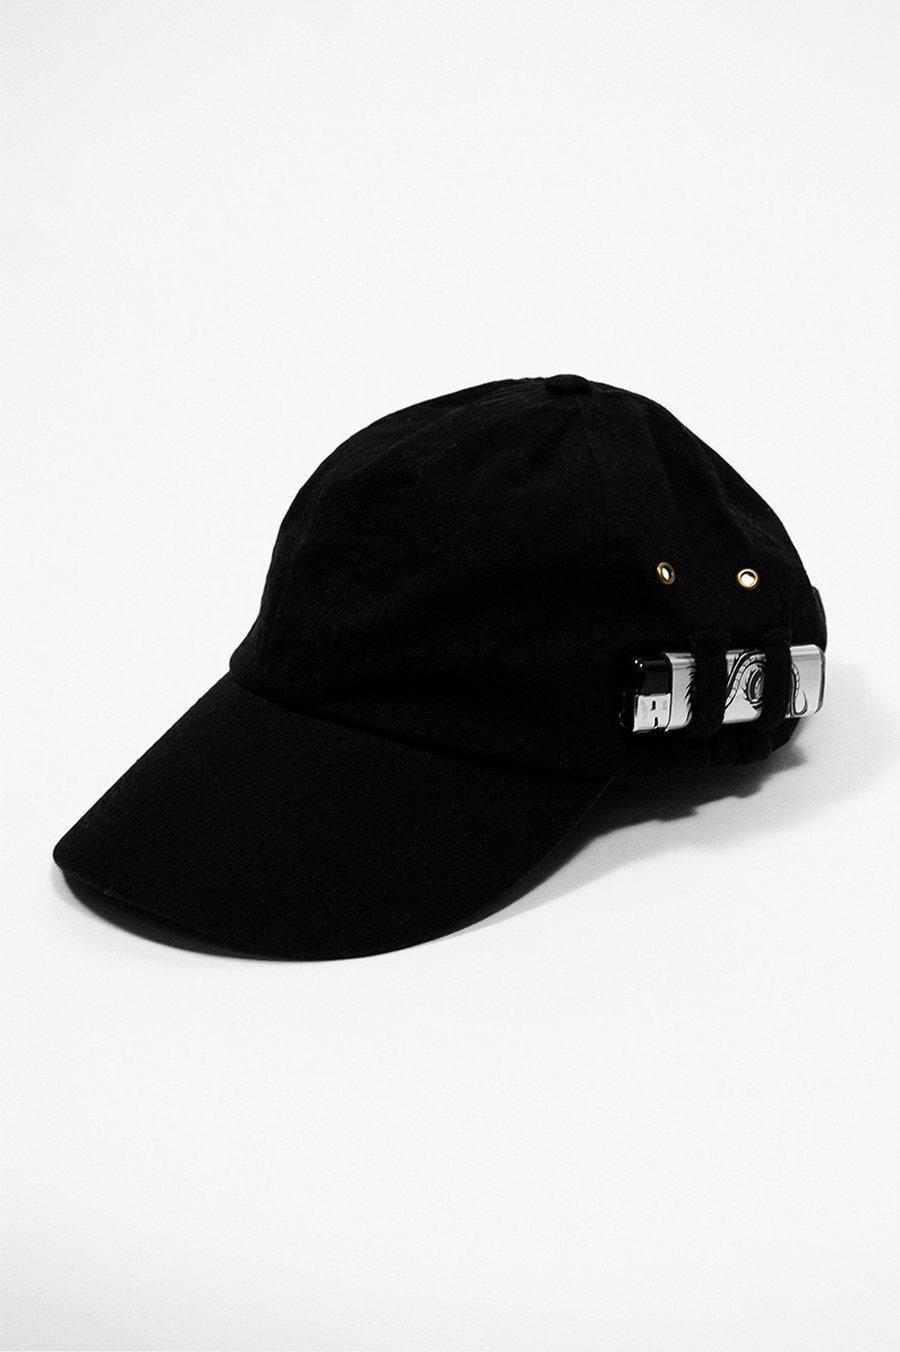 Image of Fire Cap (black)